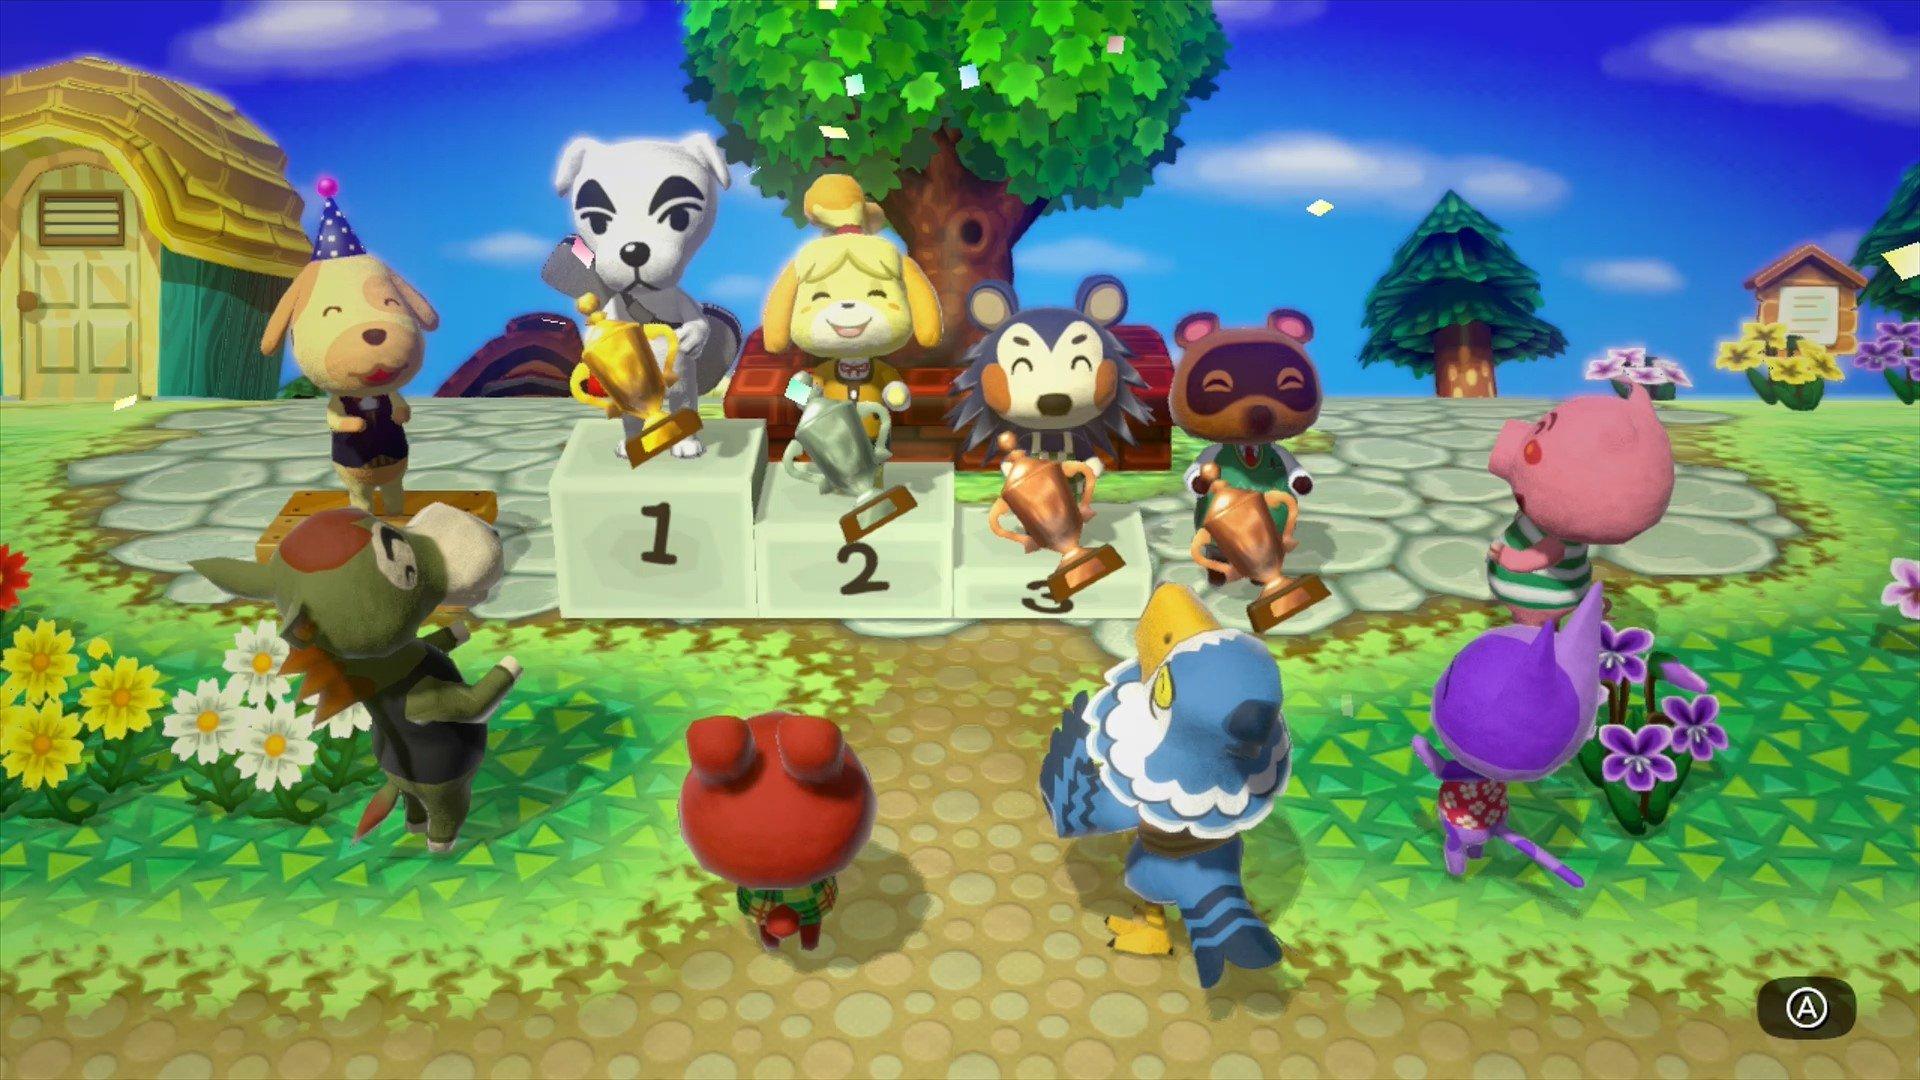 Animal crossing amiibo festival wii u screenshots for Happy home designer unlock guide